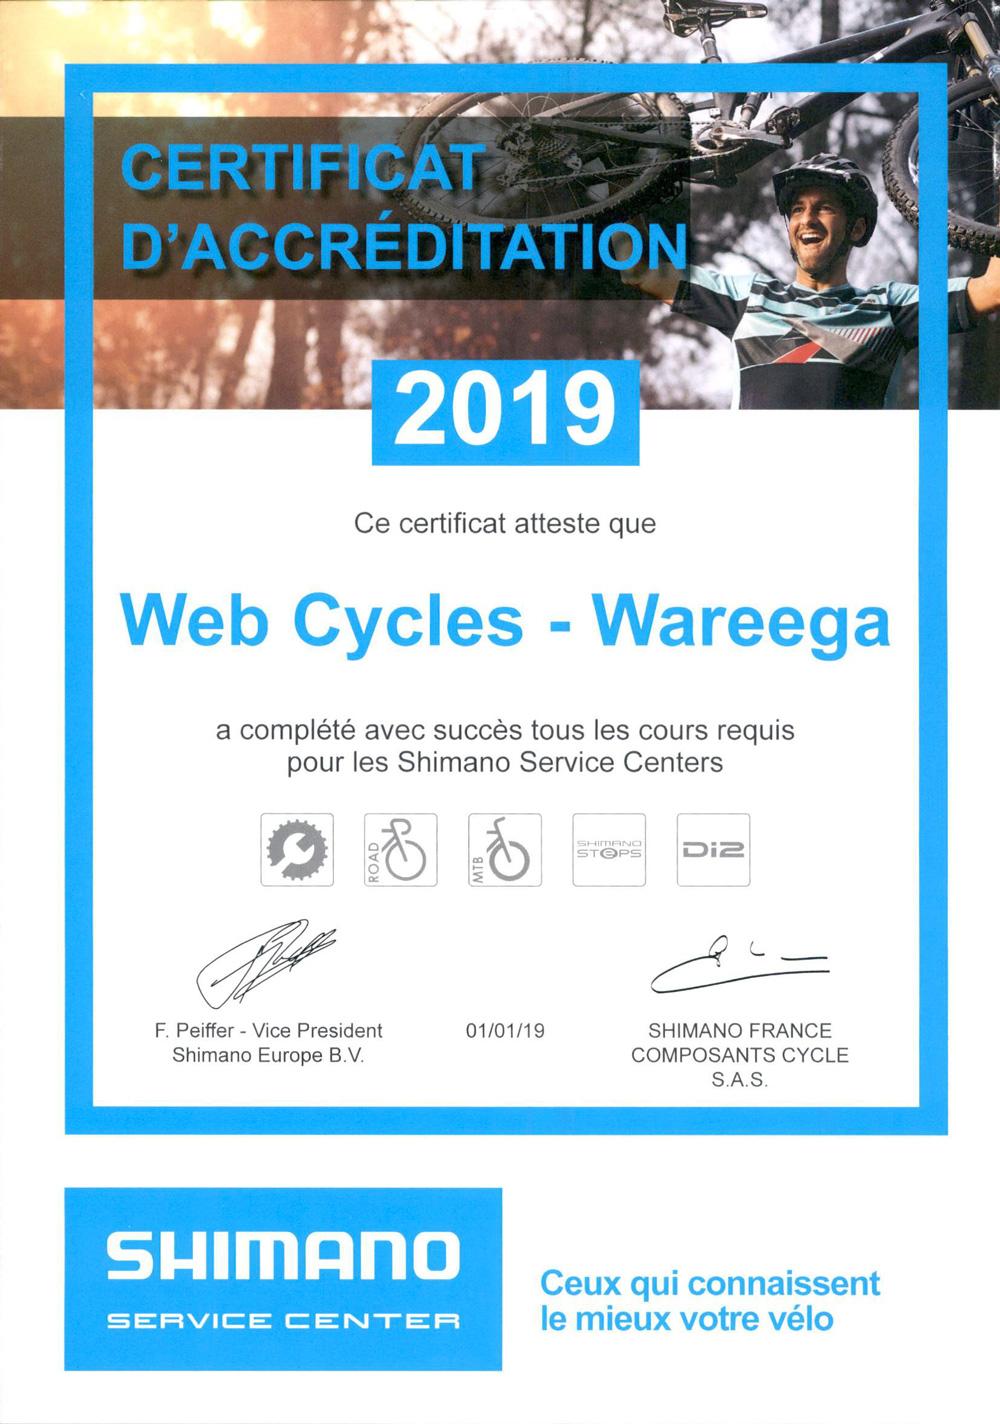 Certification Shimano Wareega